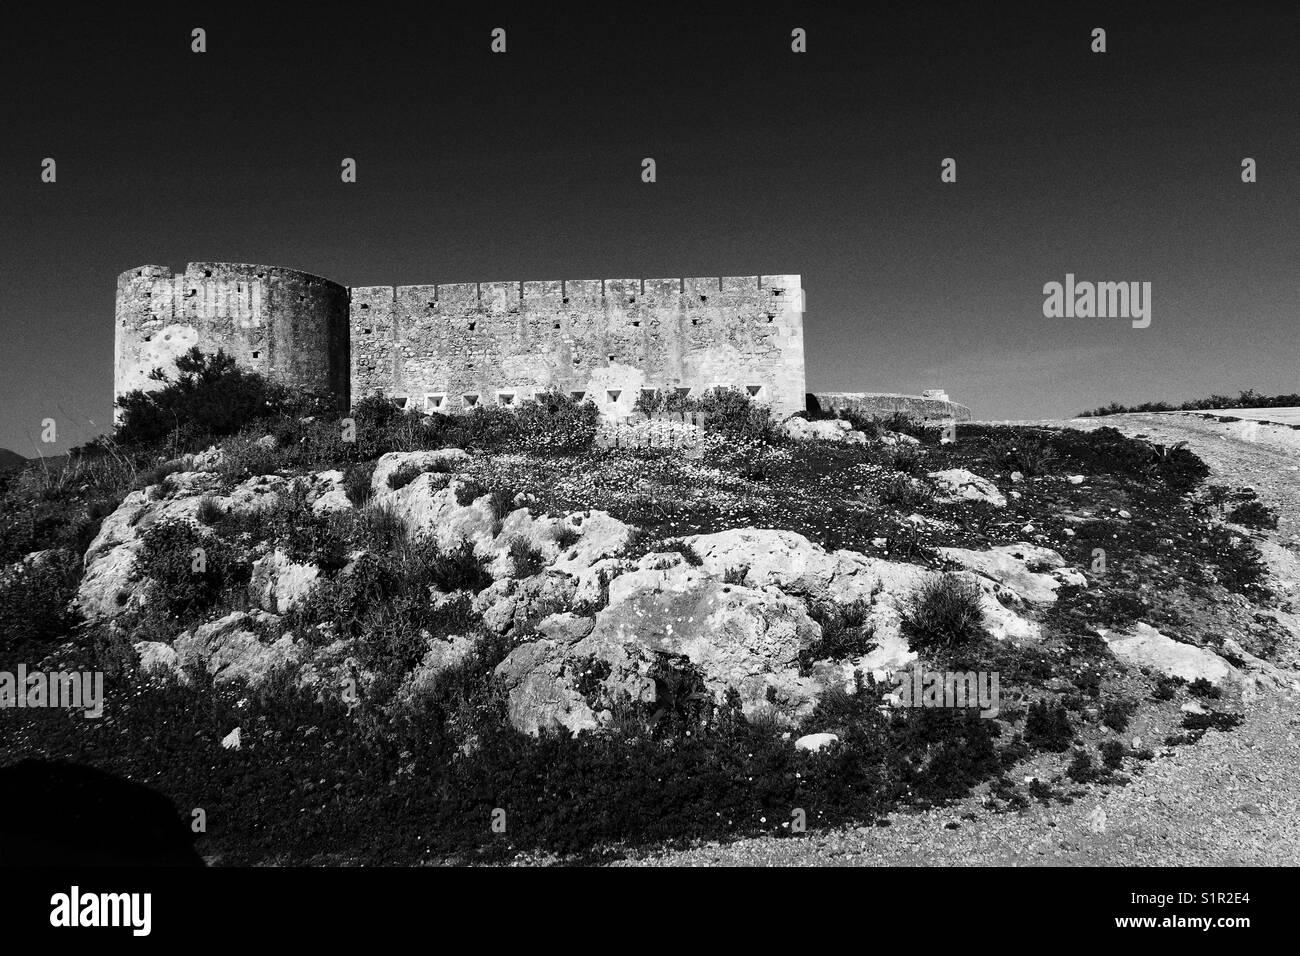 Old Venetian fort, Crete - Stock Image